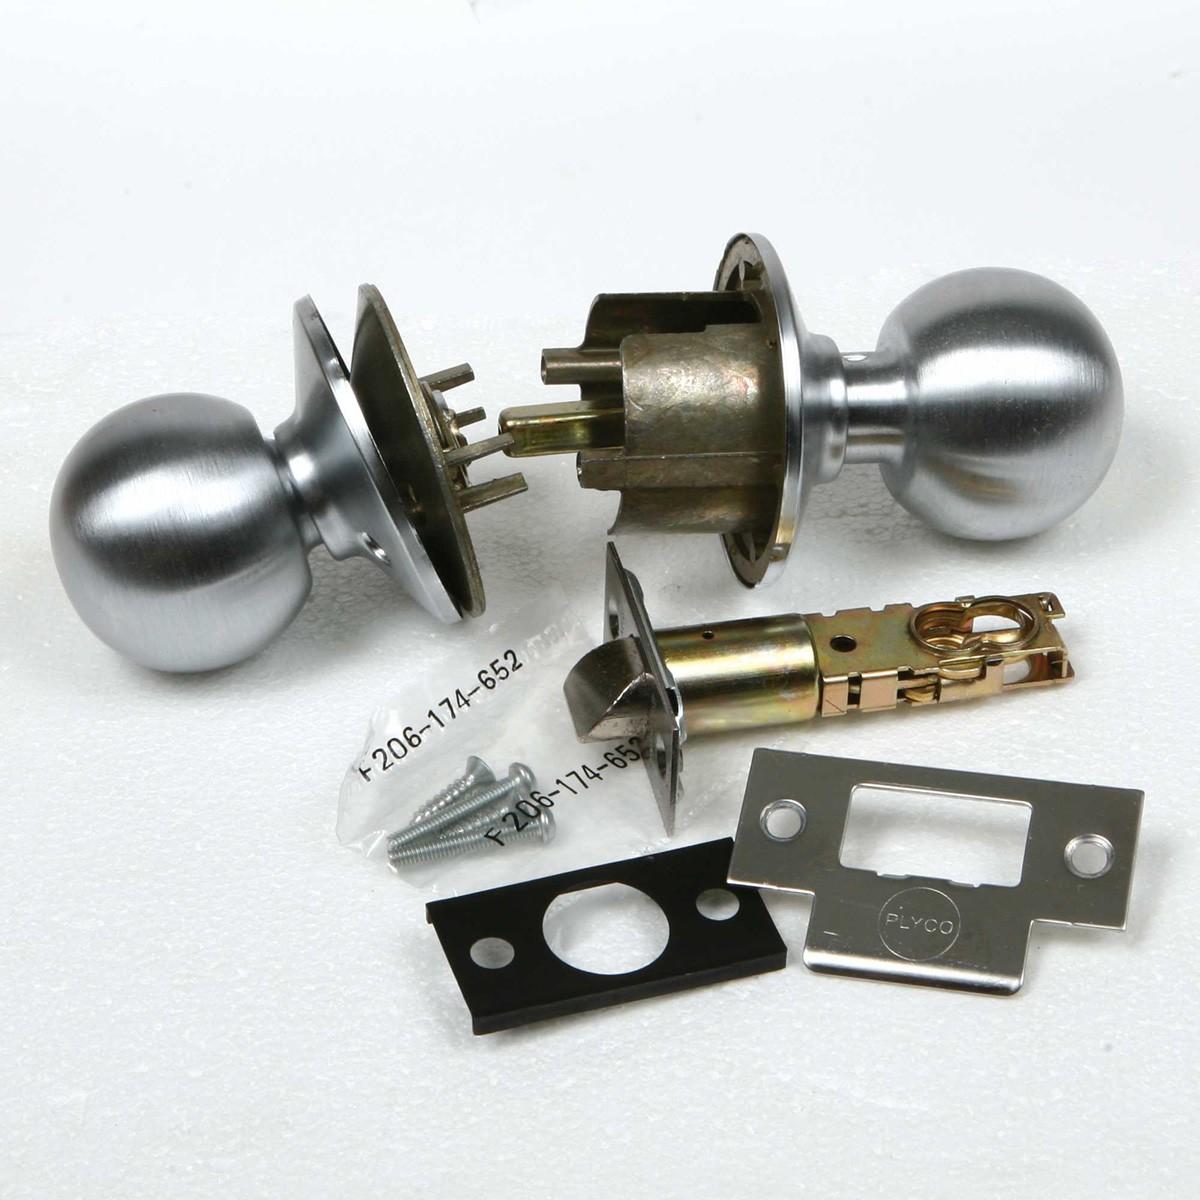 parts of a door knob photo - 6